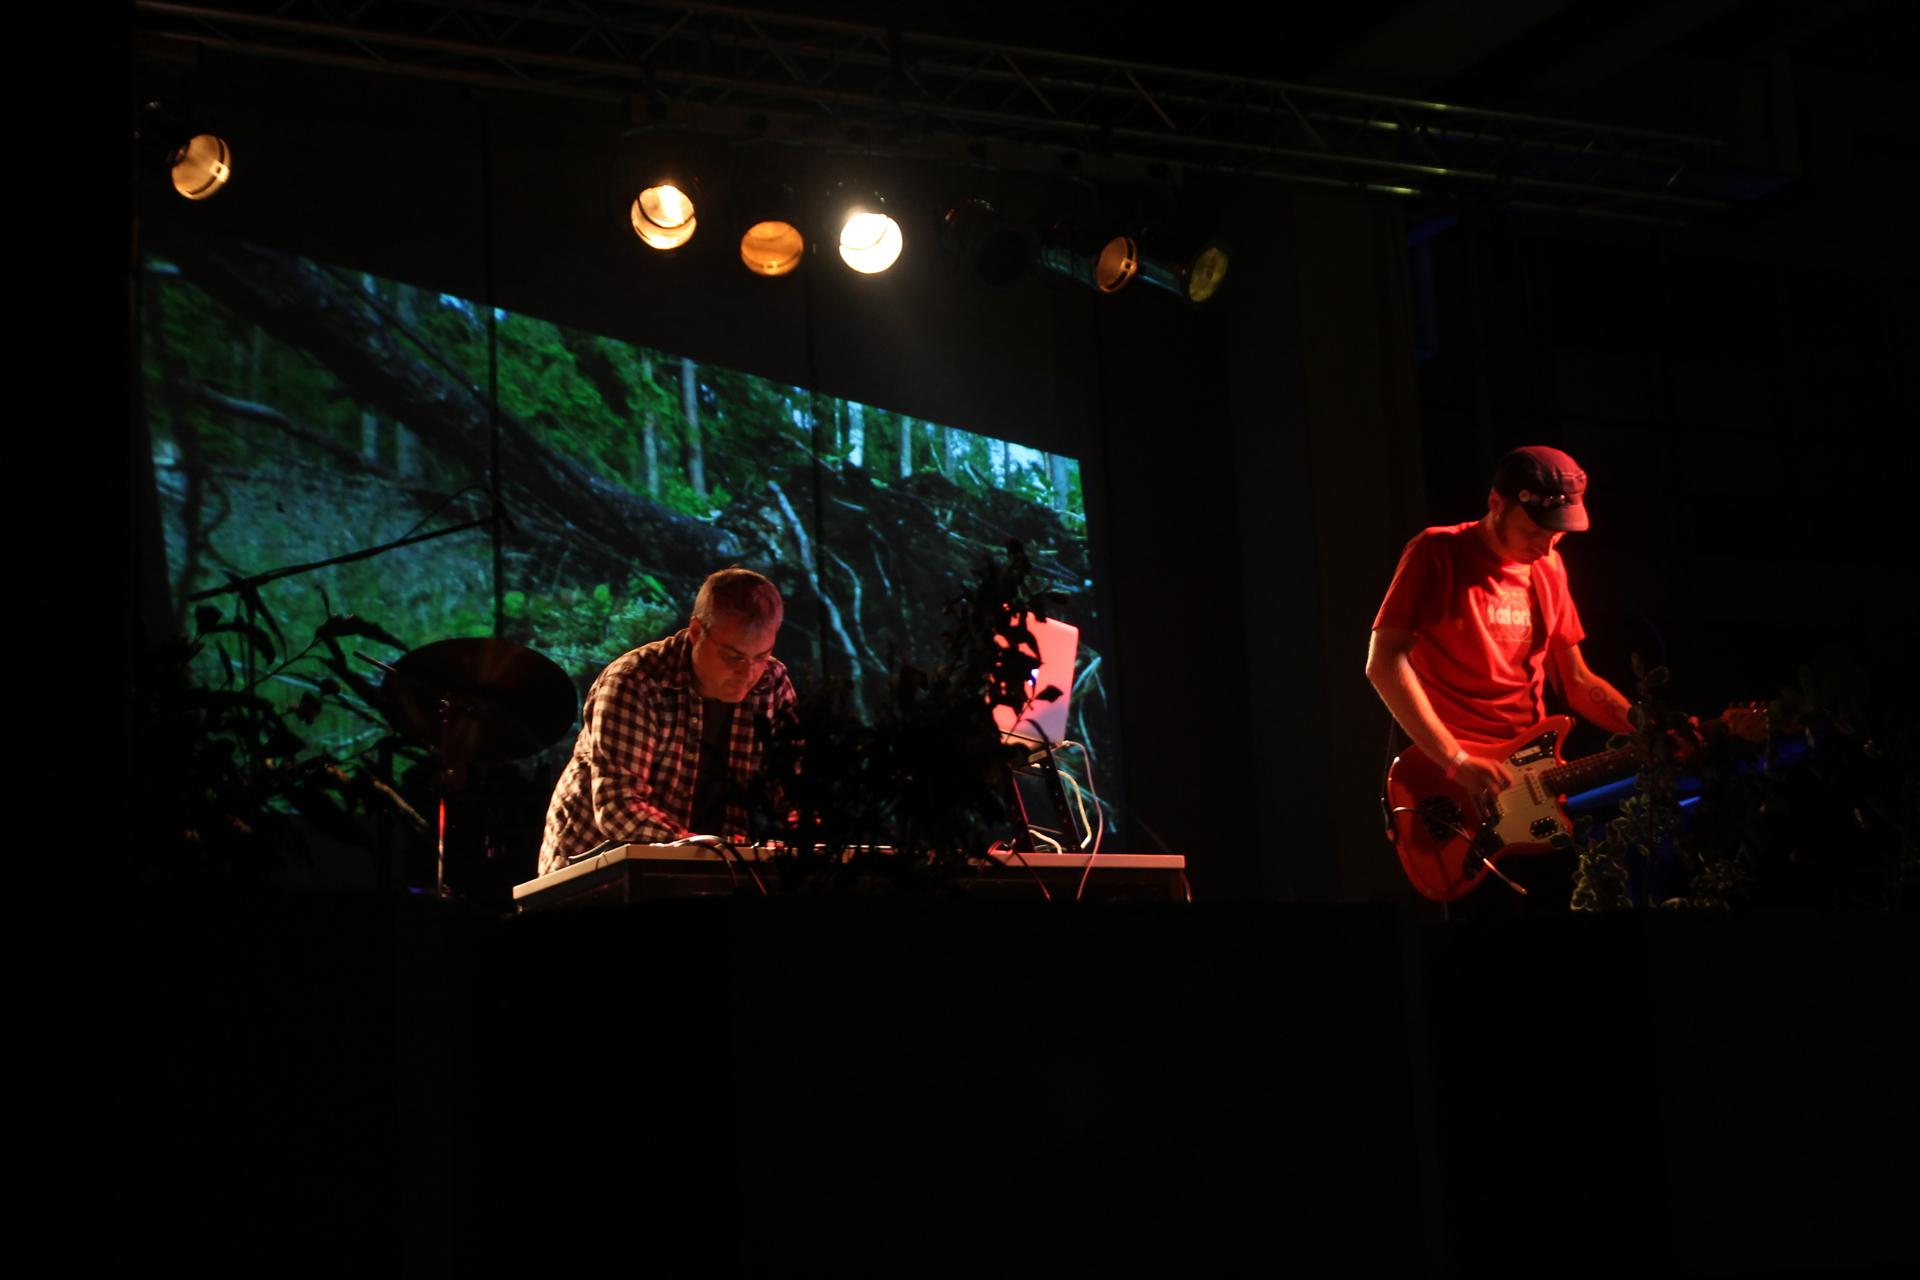 L'UniCo-Bühne beim AStA-Sommerfestival 2014